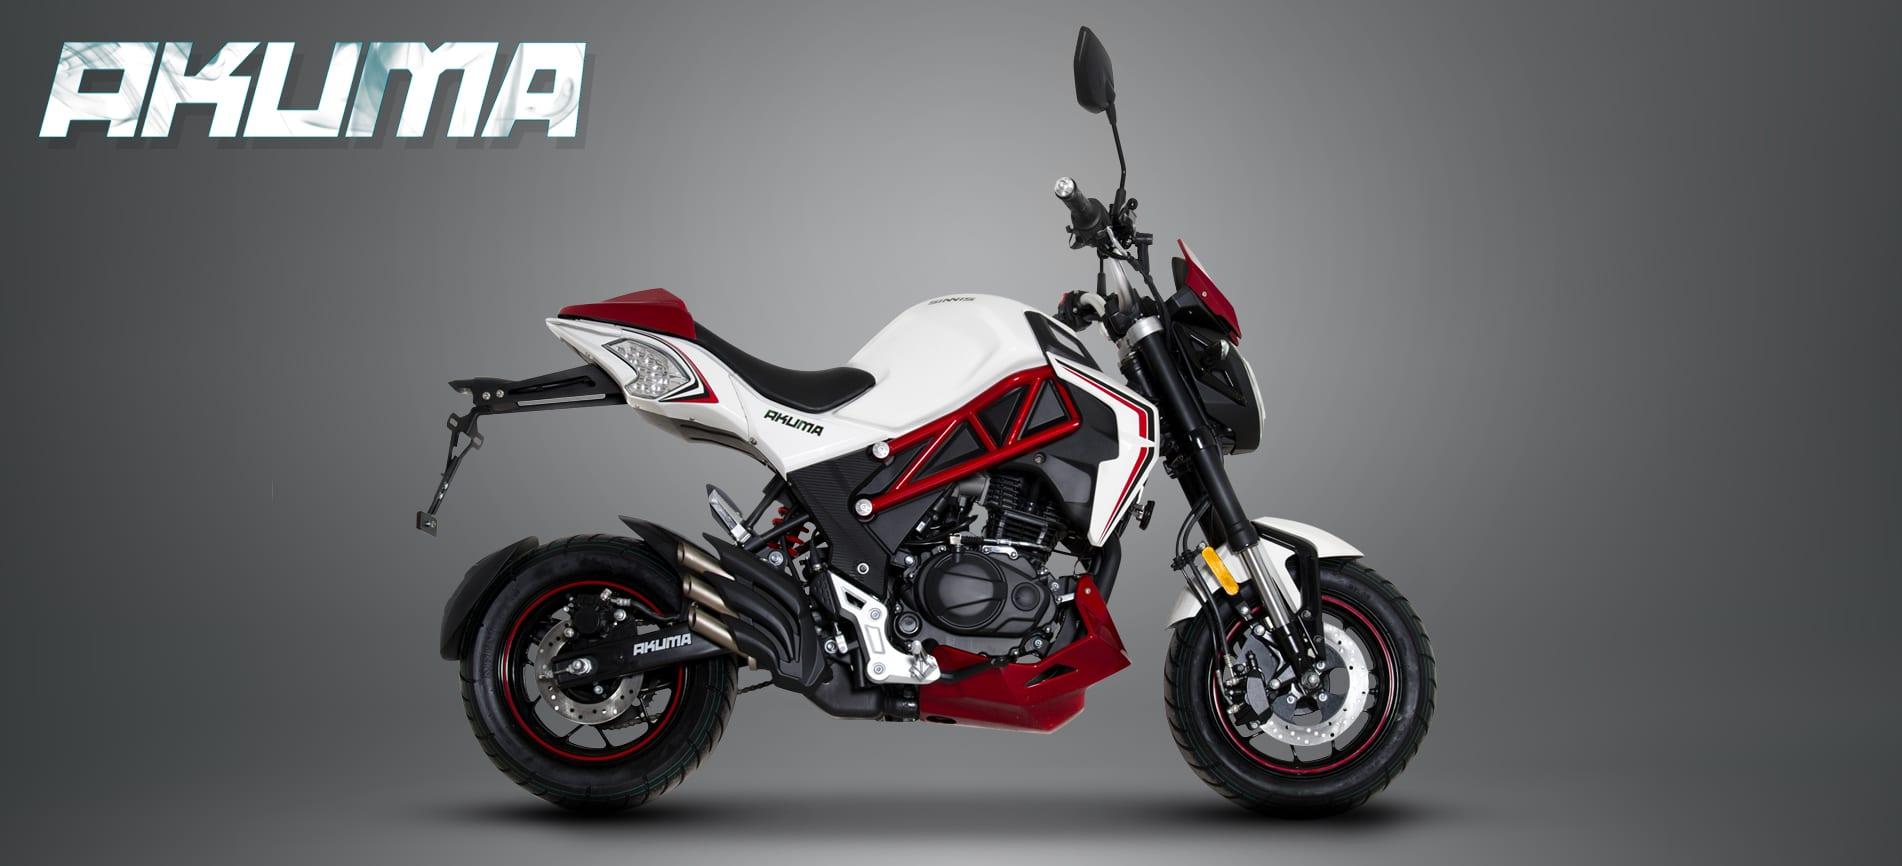 Sinnis 125cc Akuma Motorcycle wjite and red